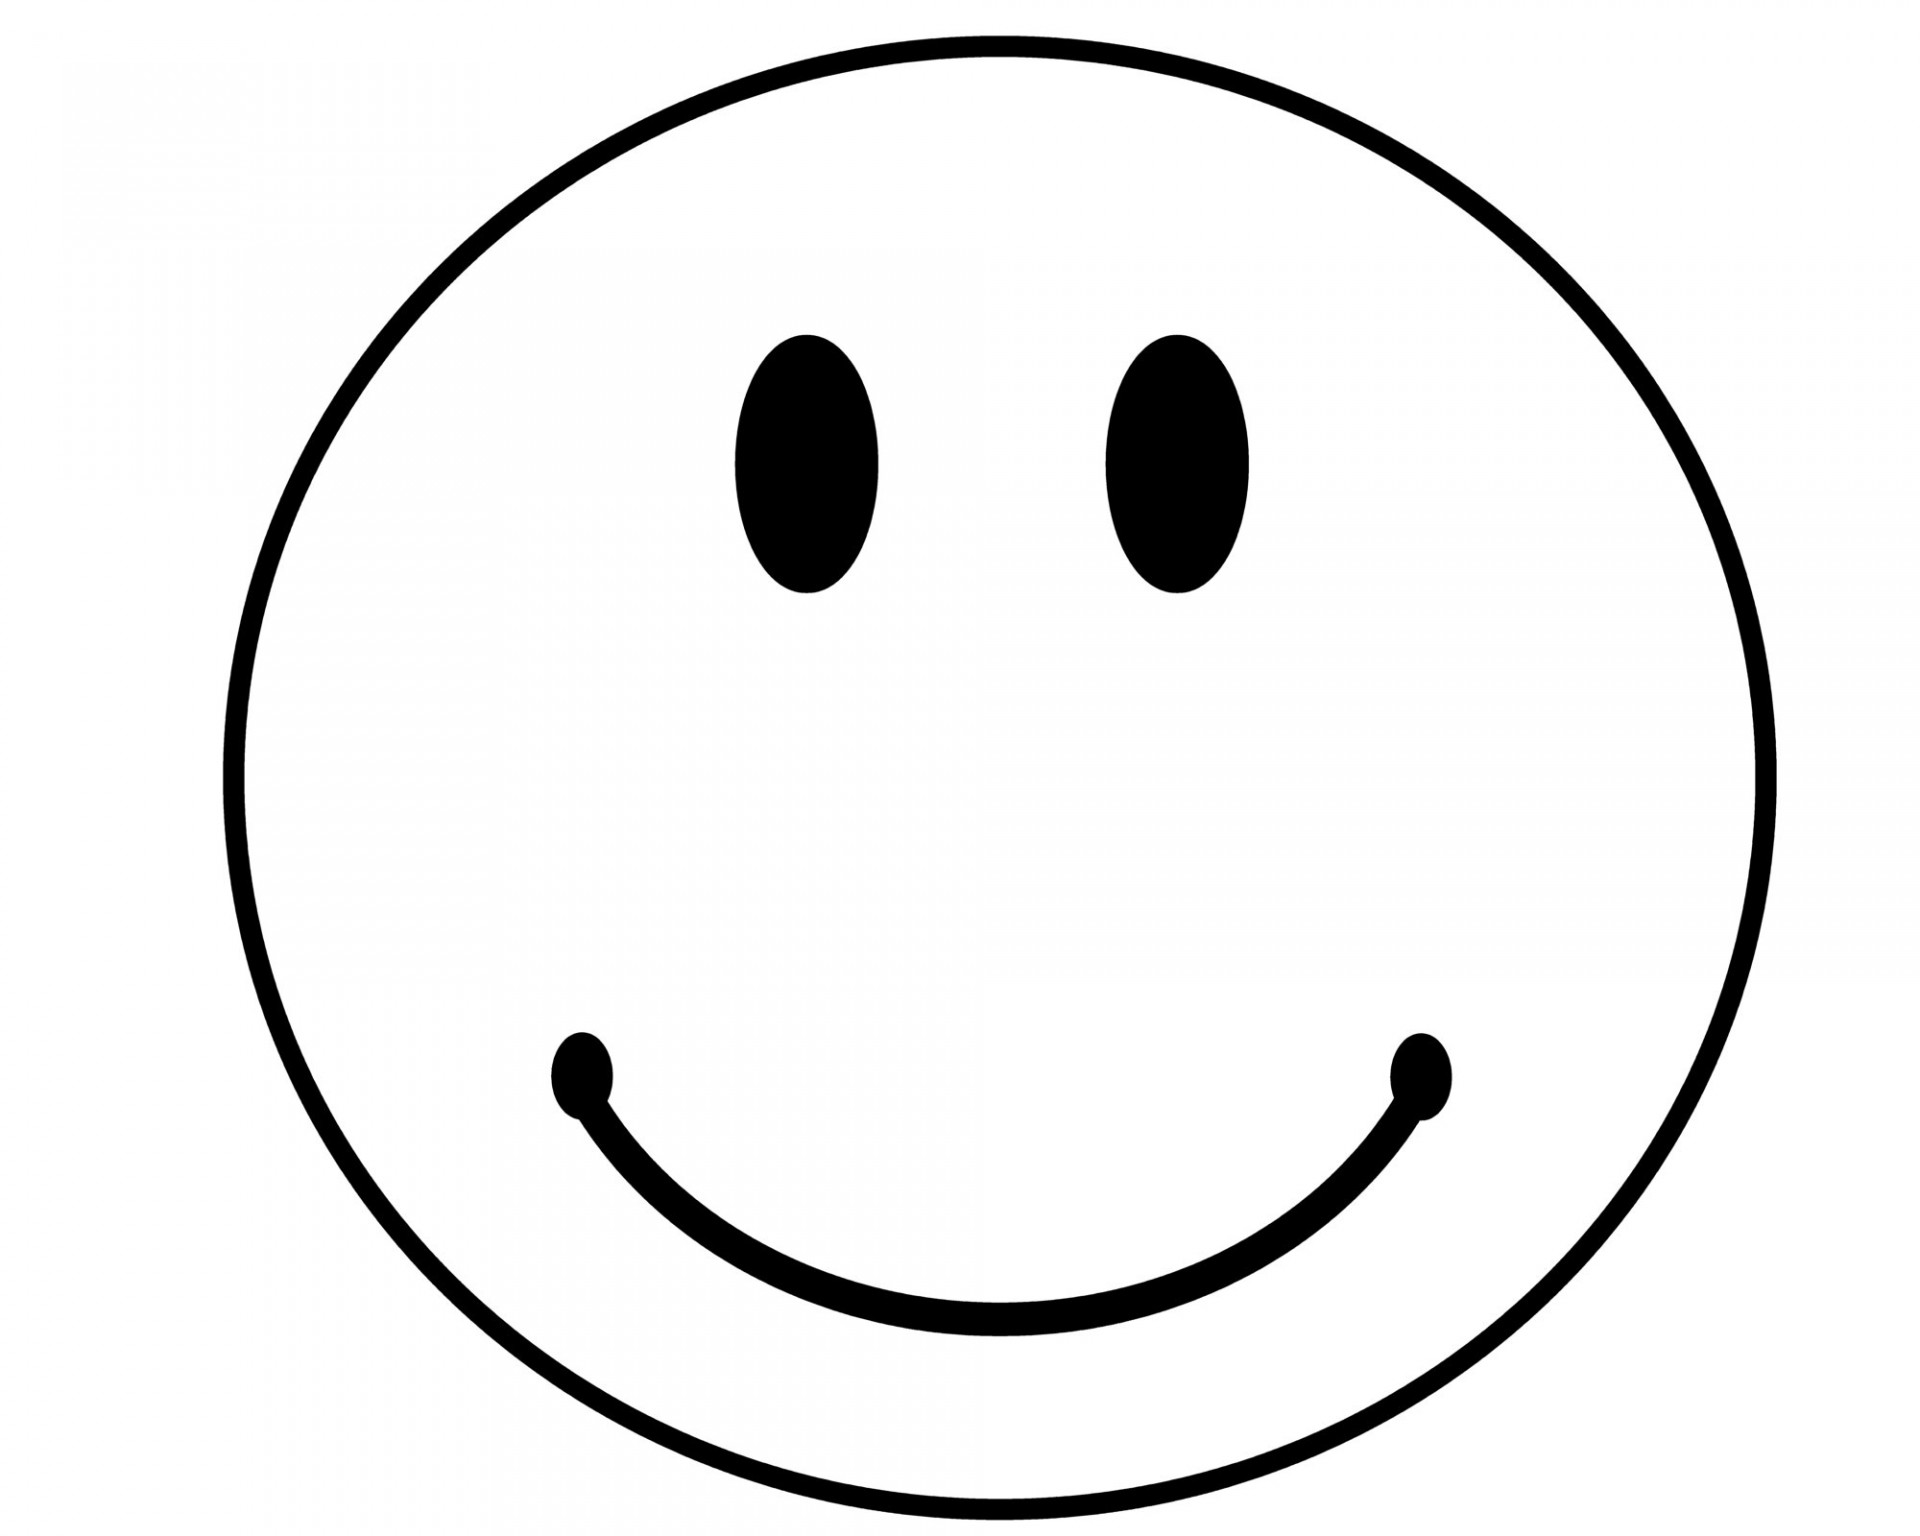 Free Clip Art Smiley Face Tumundografico-Free clip art smiley face tumundografico-7